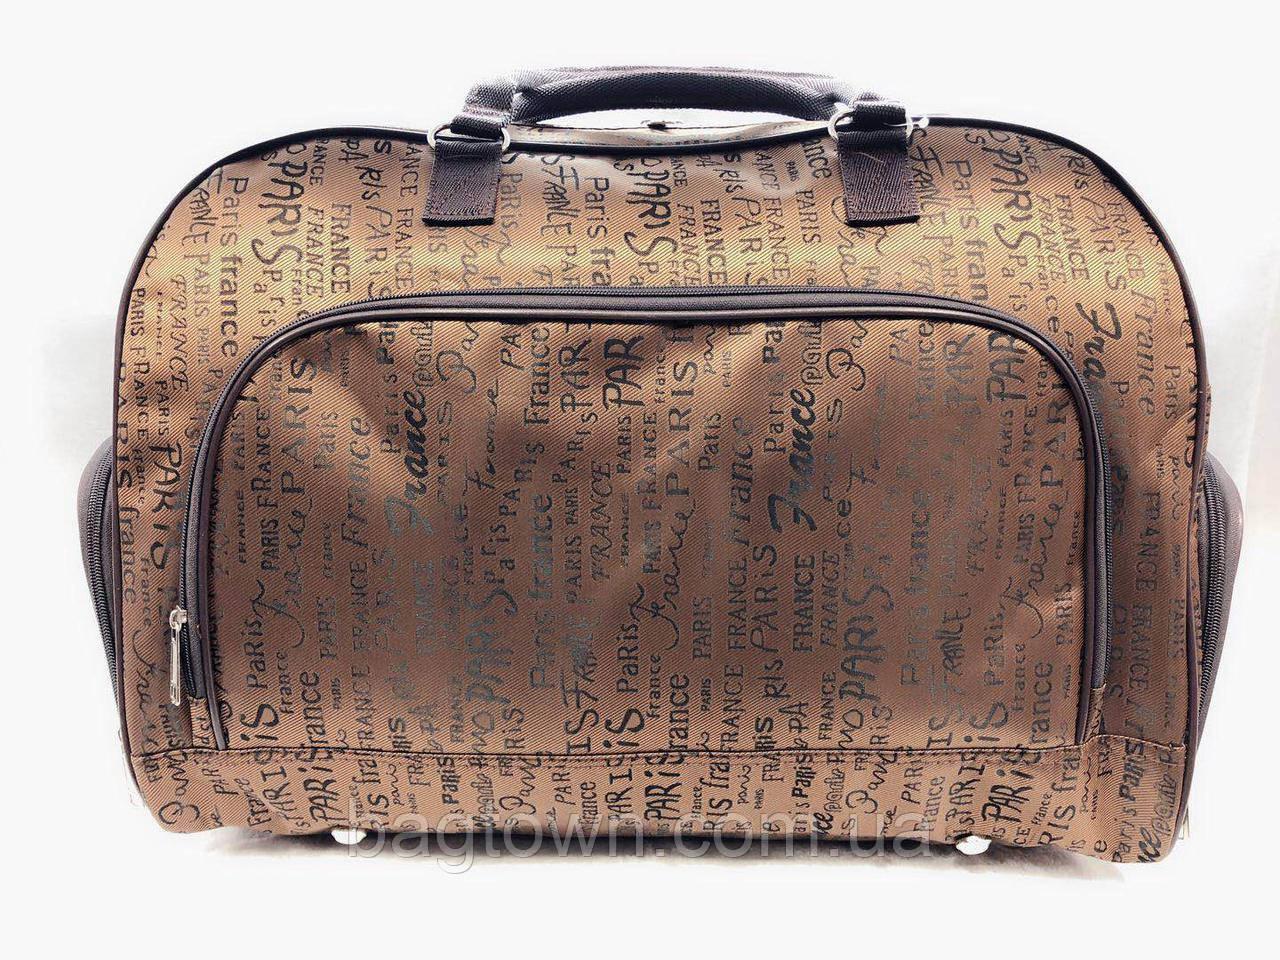 2e9e572a8df3 Дорожная сумка унисекс текстильная, цена 330 грн., купить в Одессе —  Prom.ua (ID#821867604)